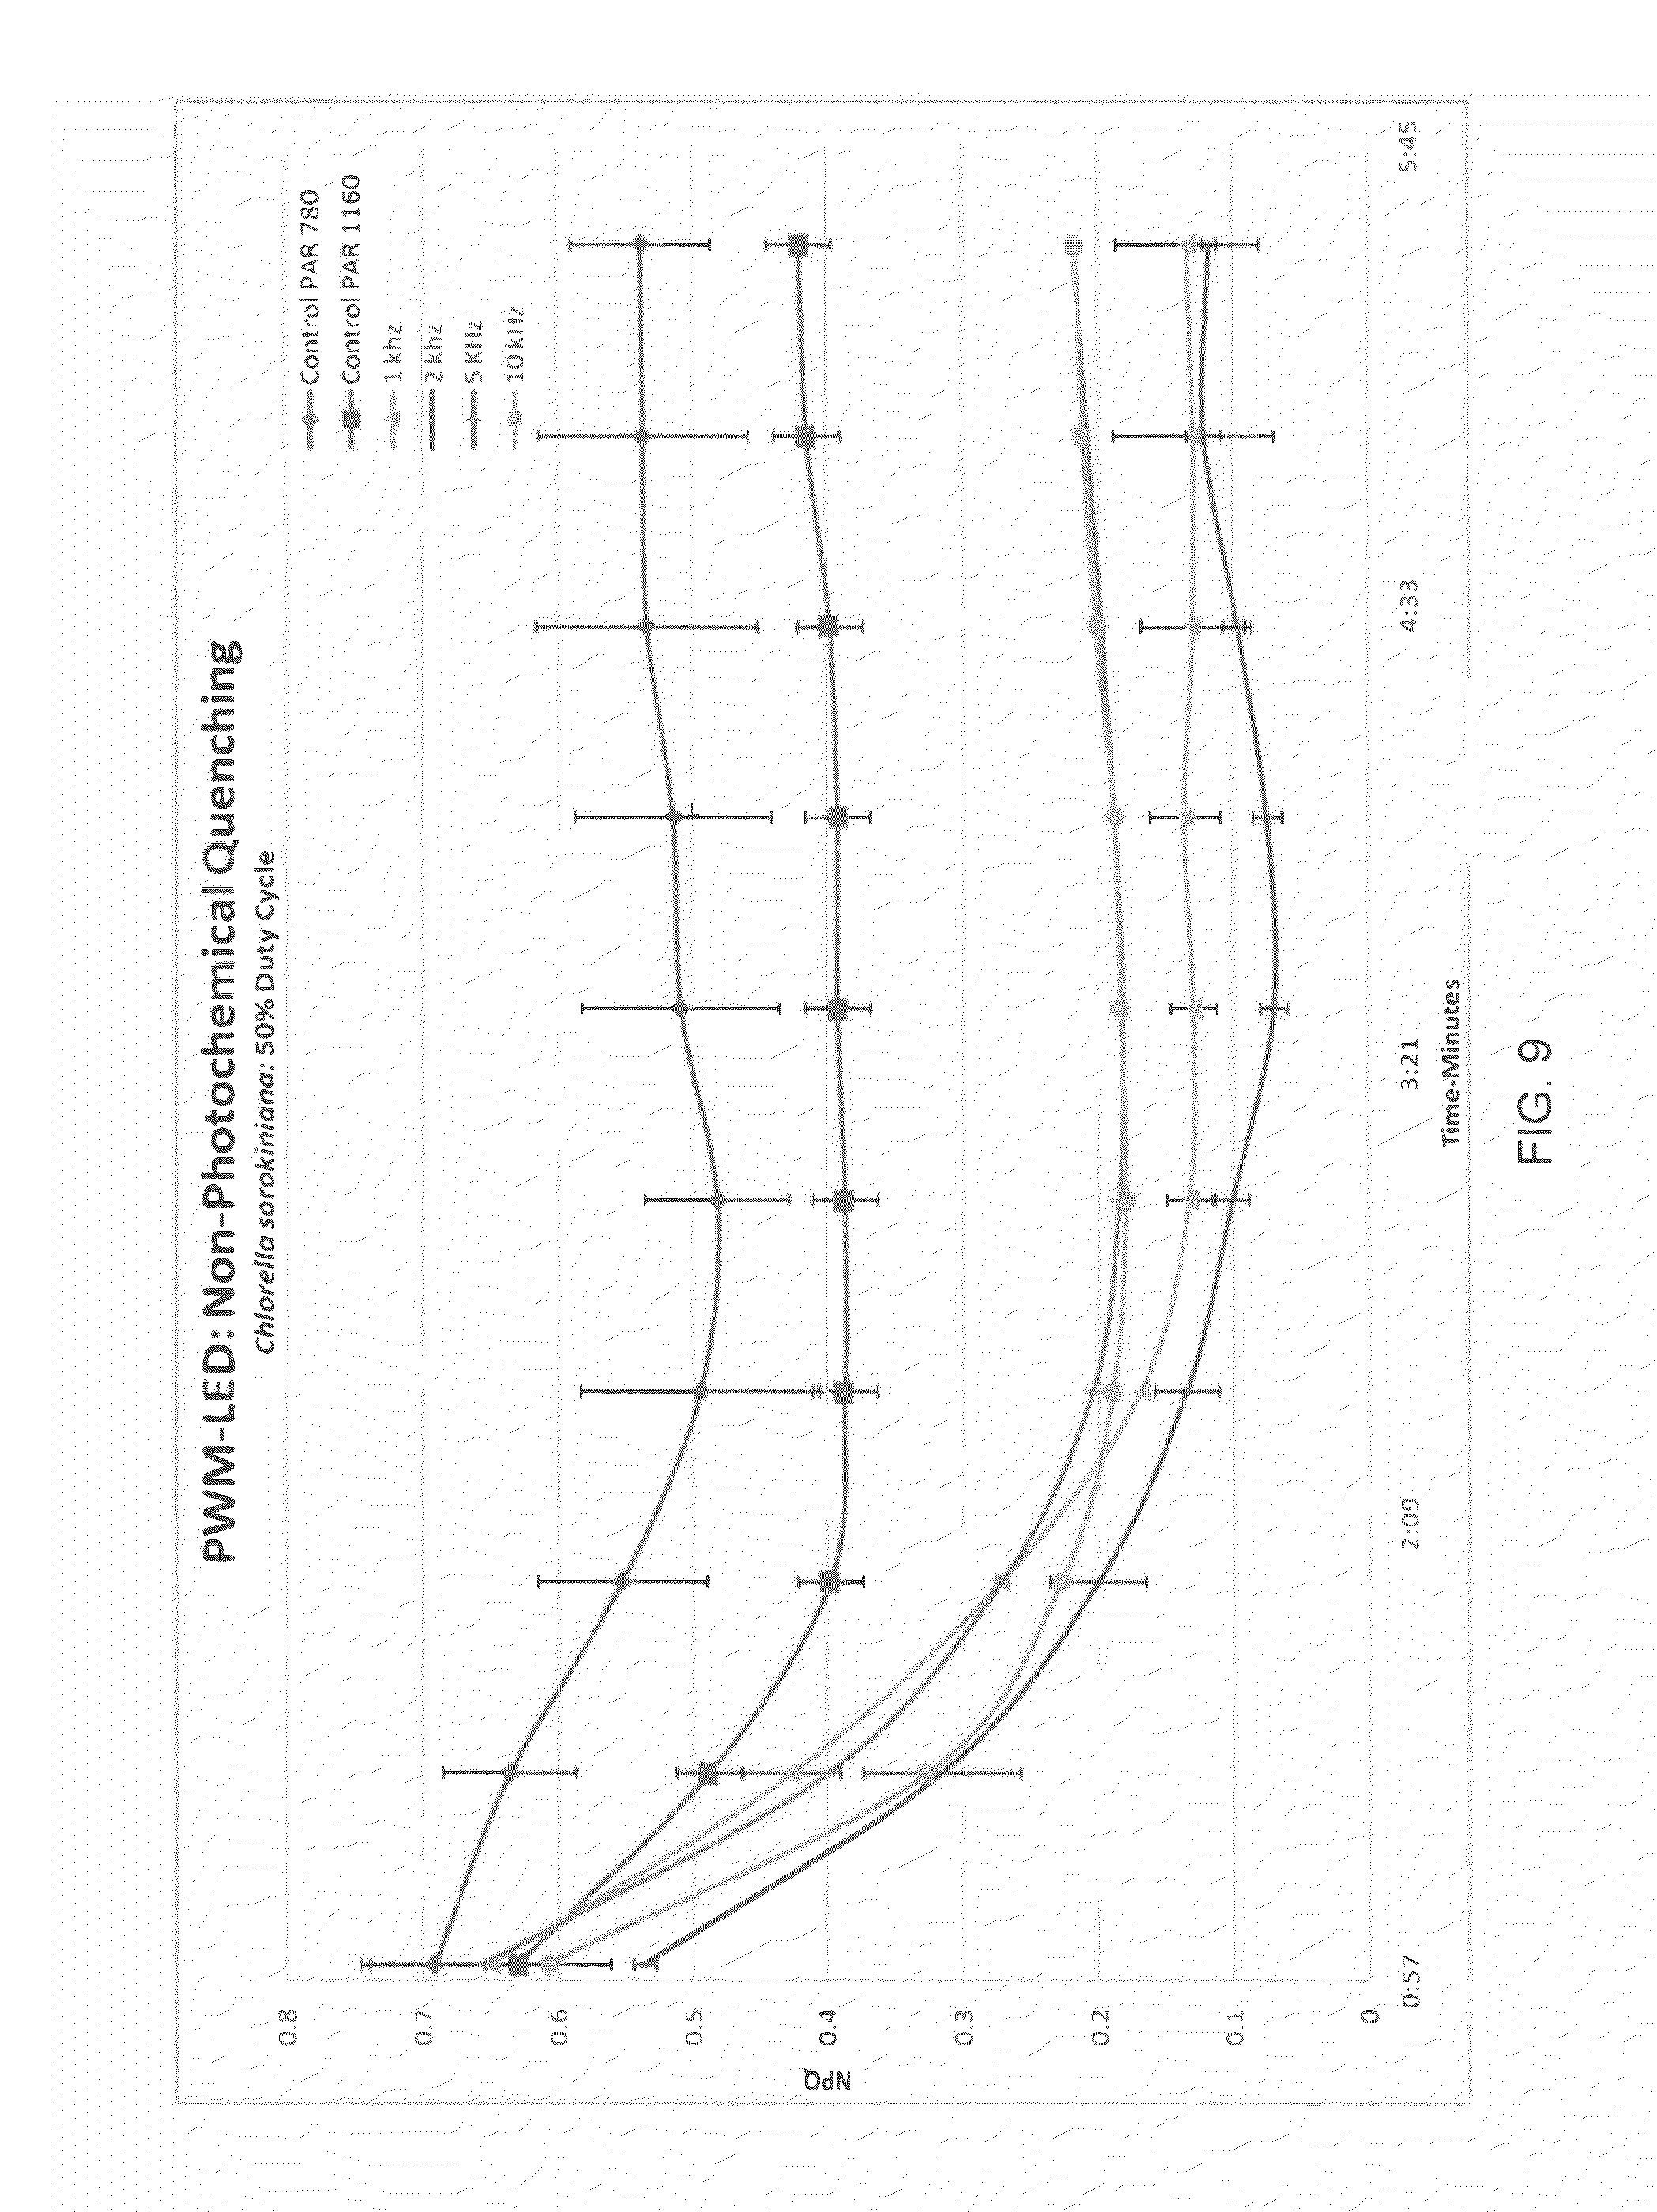 Multi Tap Ballast Wiring Diagram Multi Free Engine Image